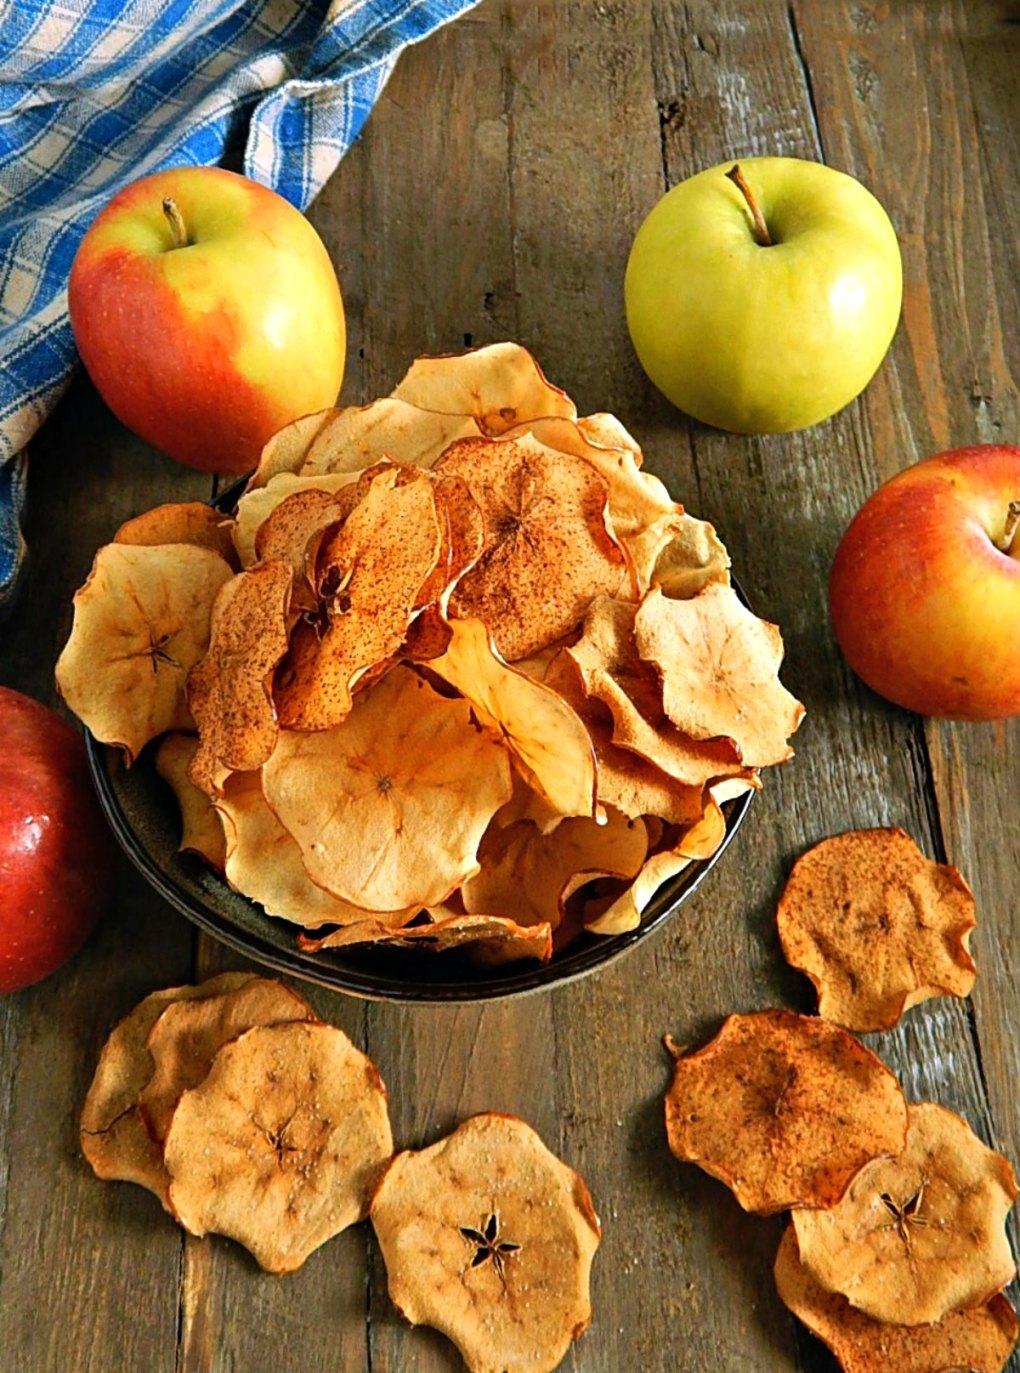 Oven Baked Apple Chips